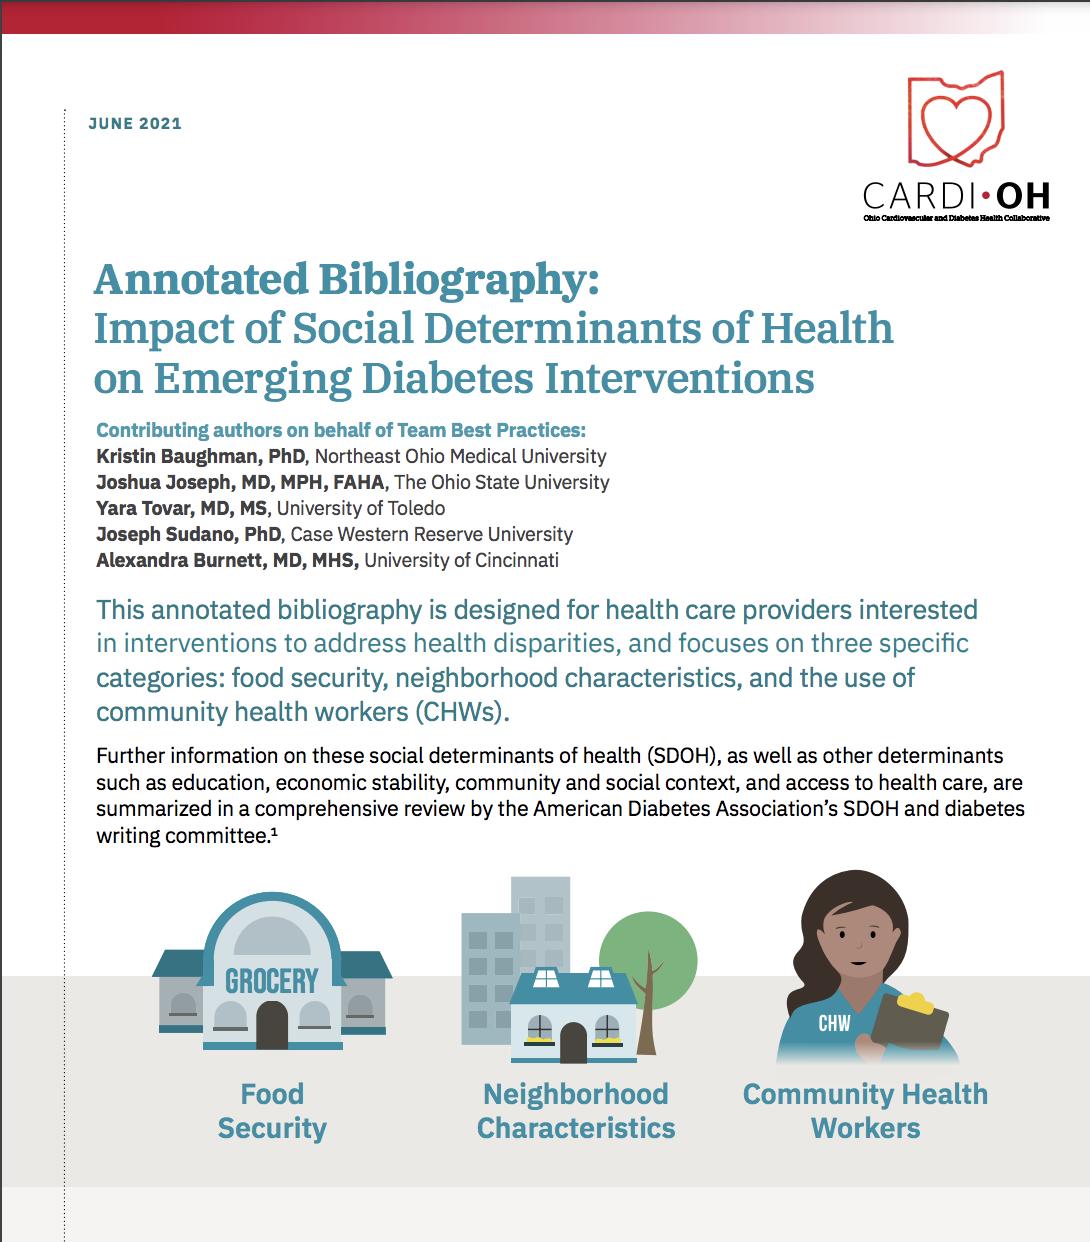 Cardi-OH Health Literacy